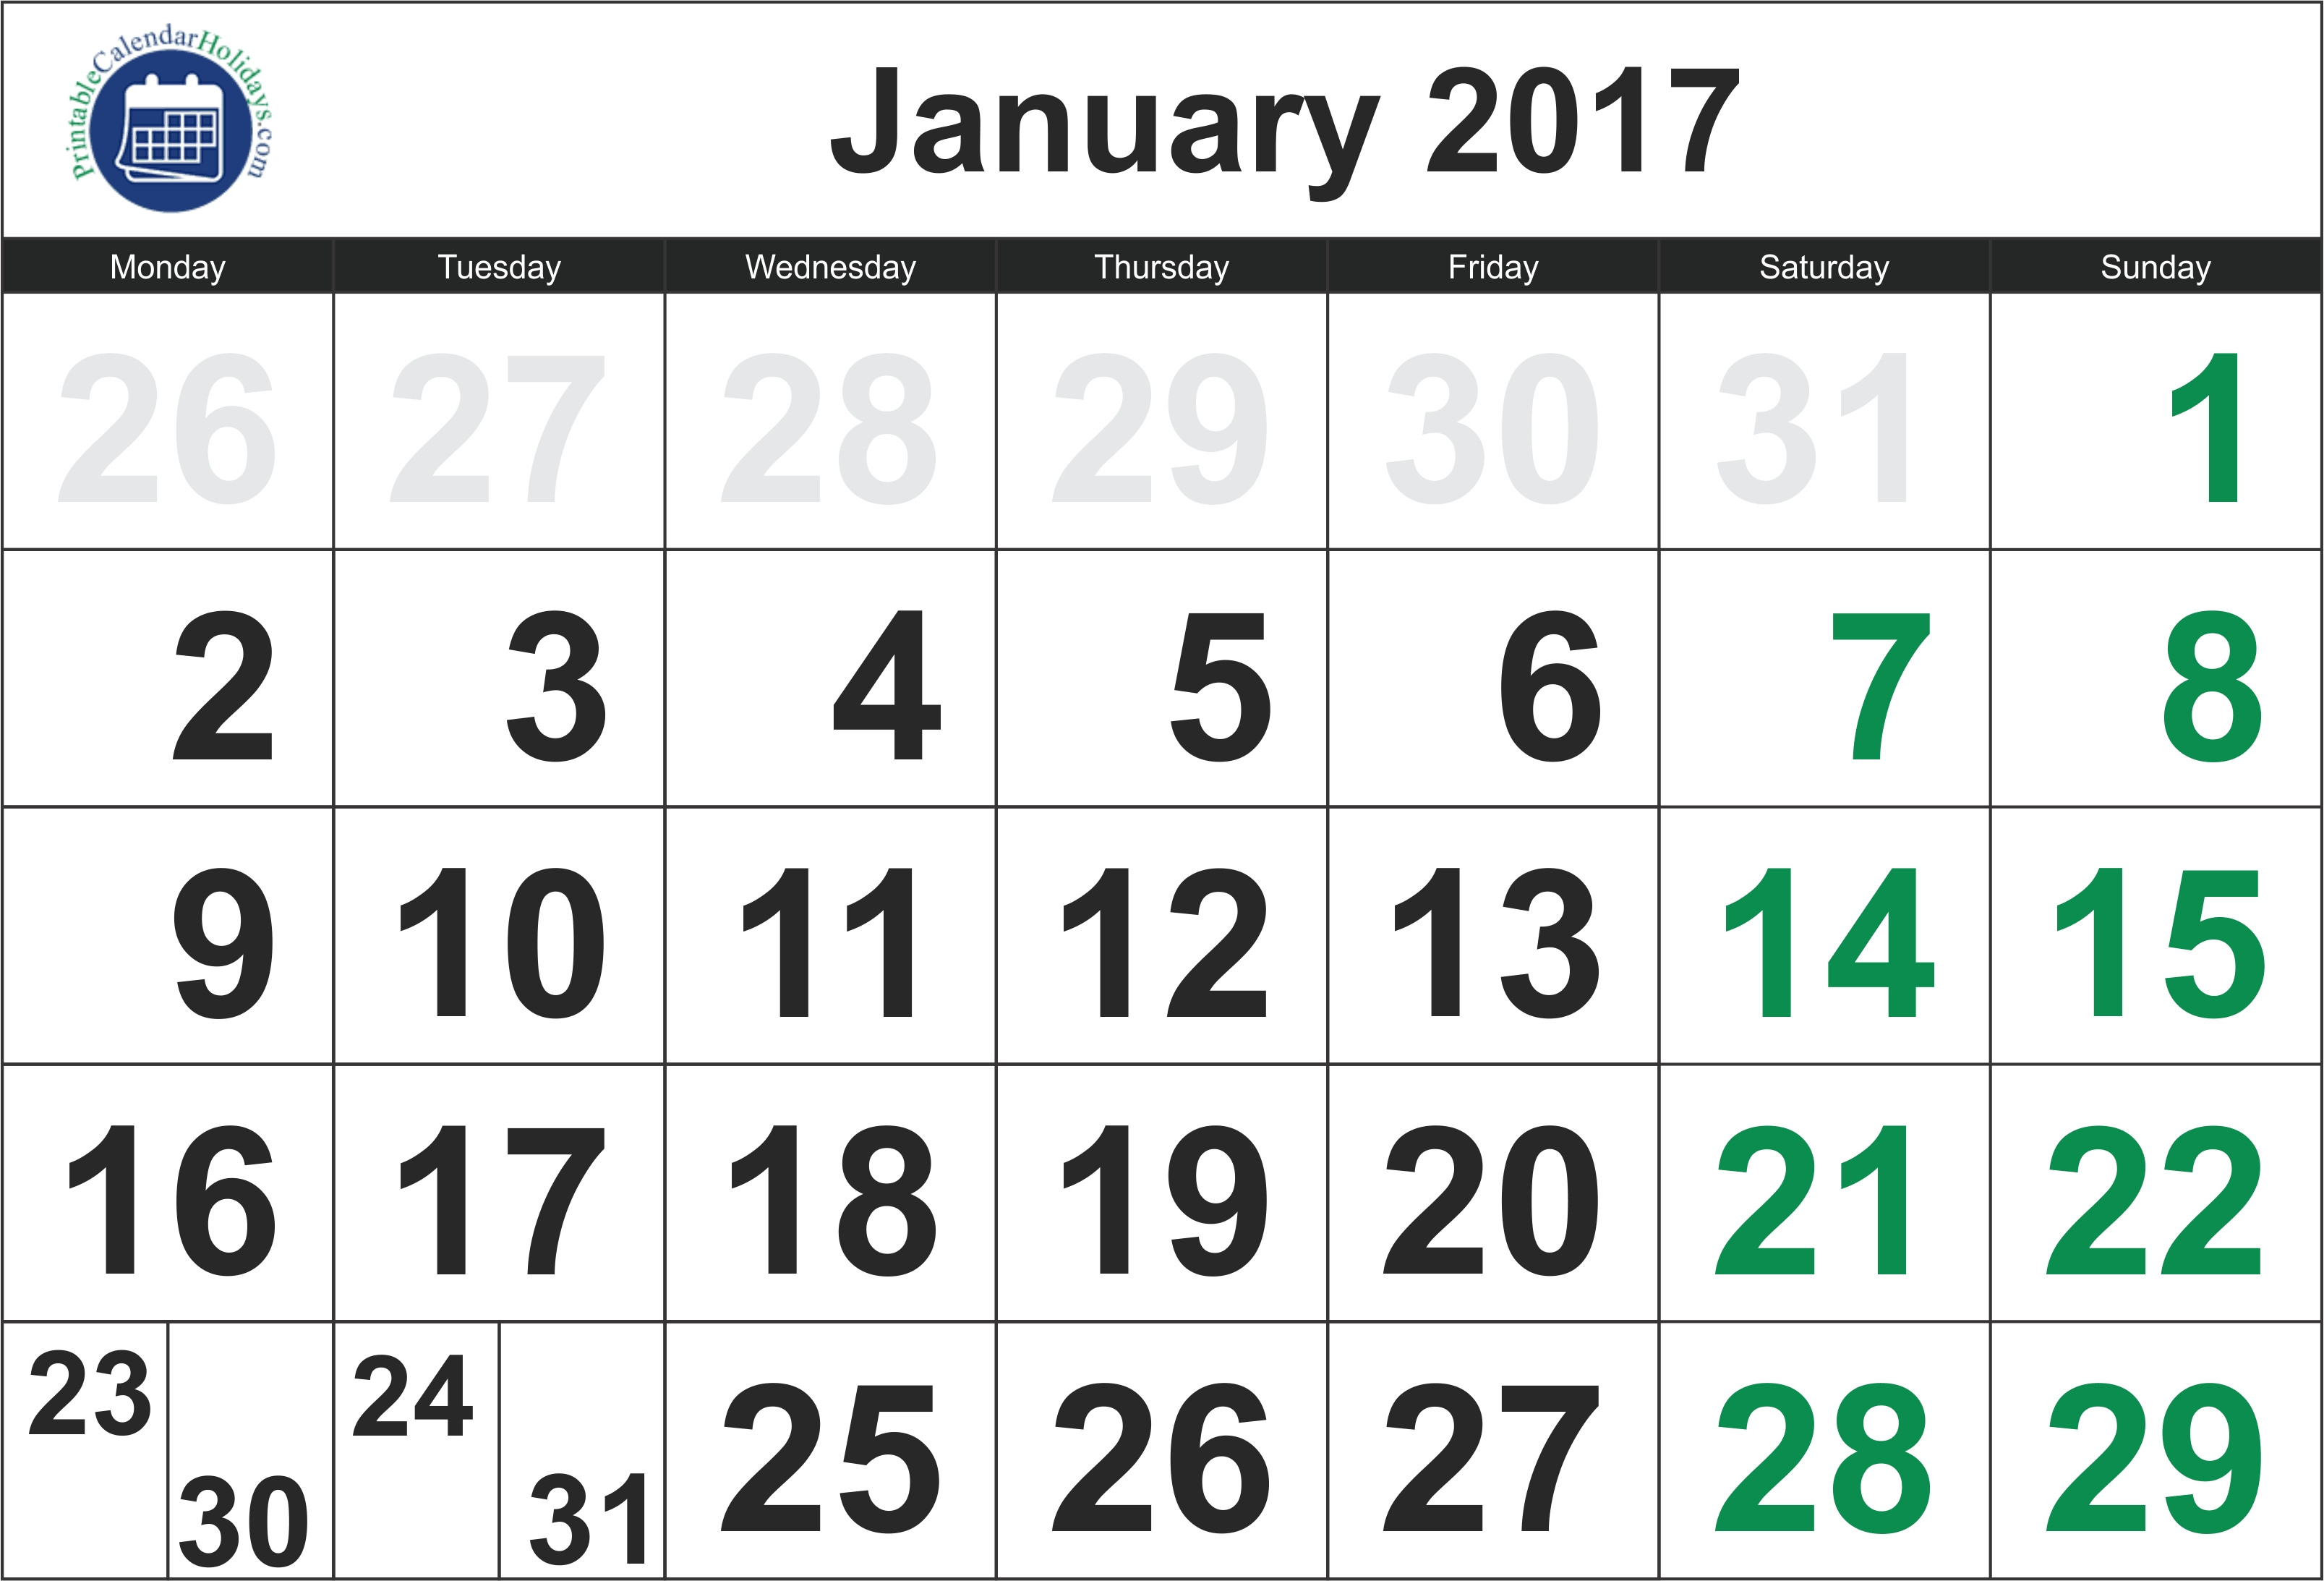 2017 January Calendar - Printable 2017 2018 2019 2020 Calendar